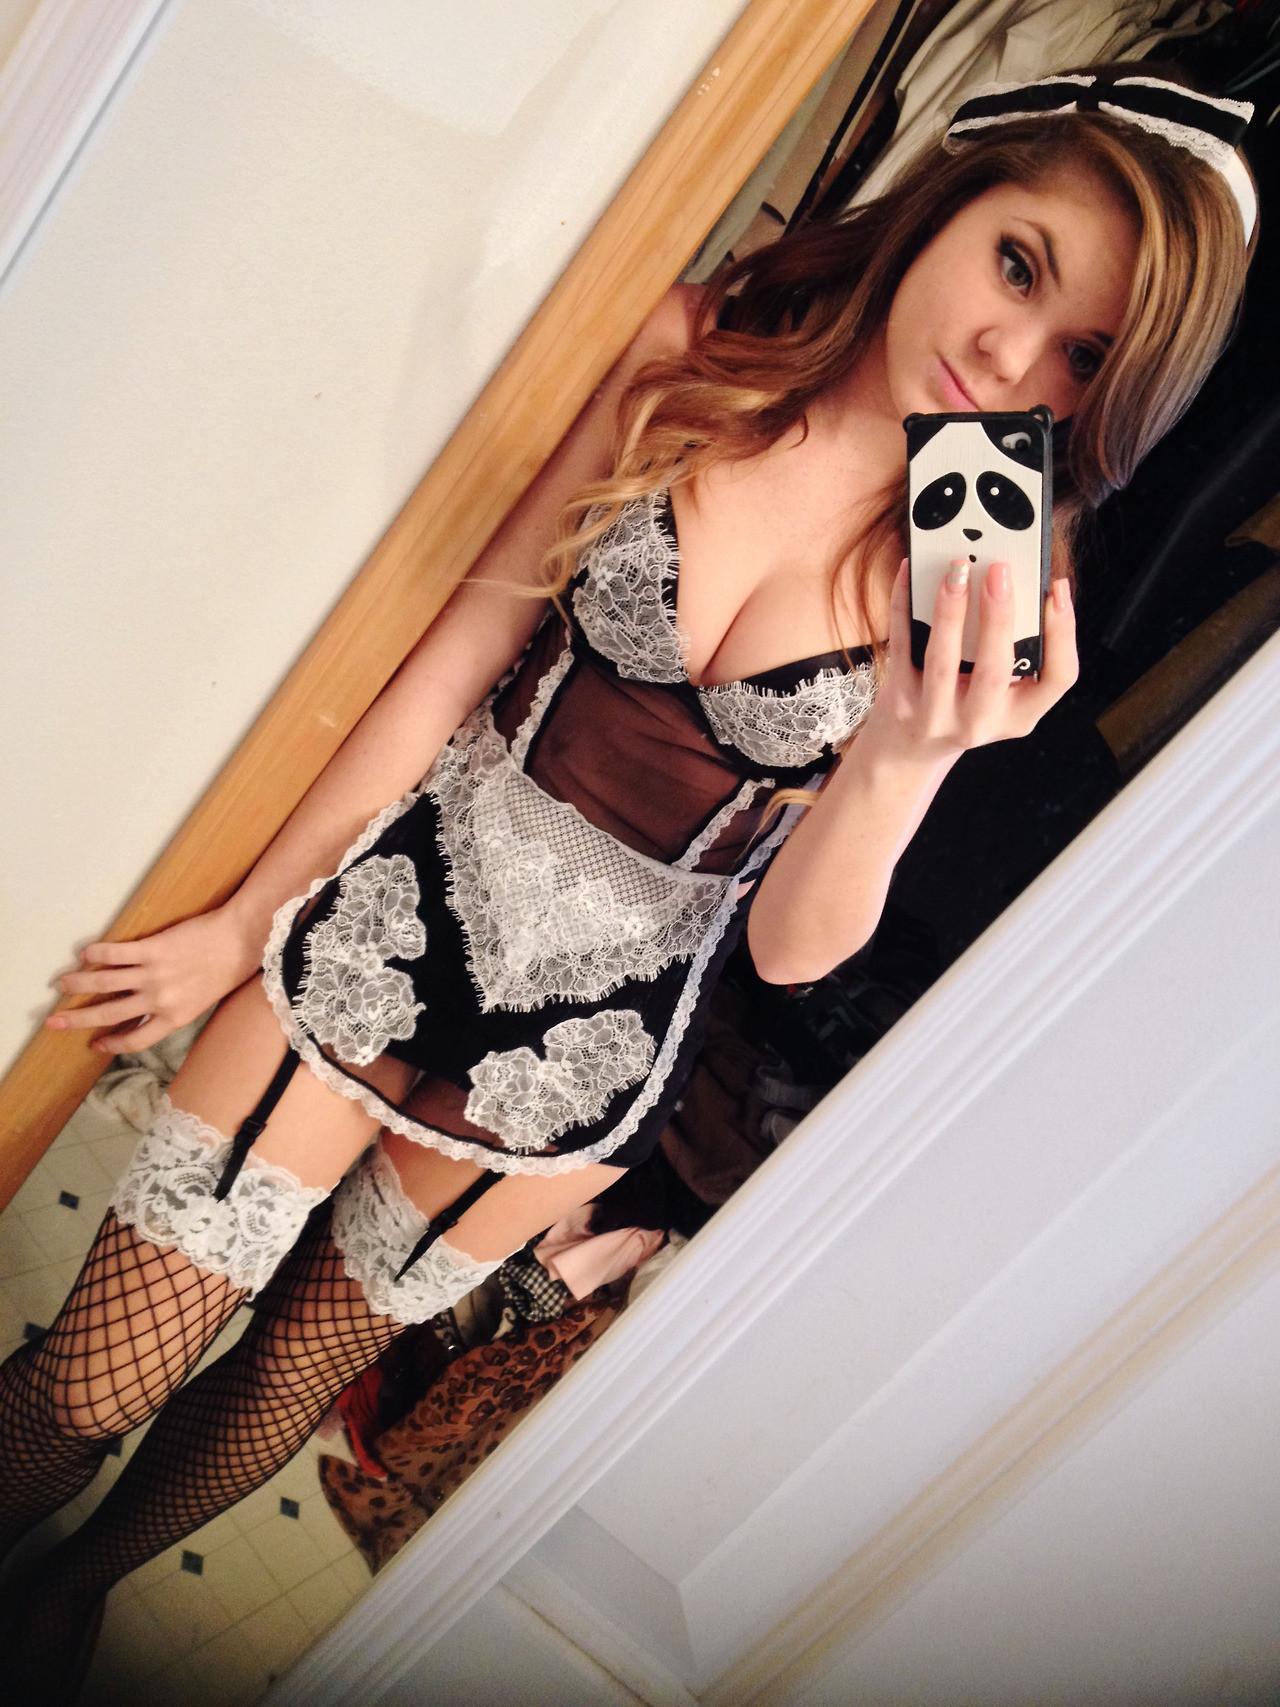 free download celeb sex bikini video celebs porn pics #amateur #hotel #ass #pawg #whooty #brunette #glasses #panties #lingerie #stockings #garters